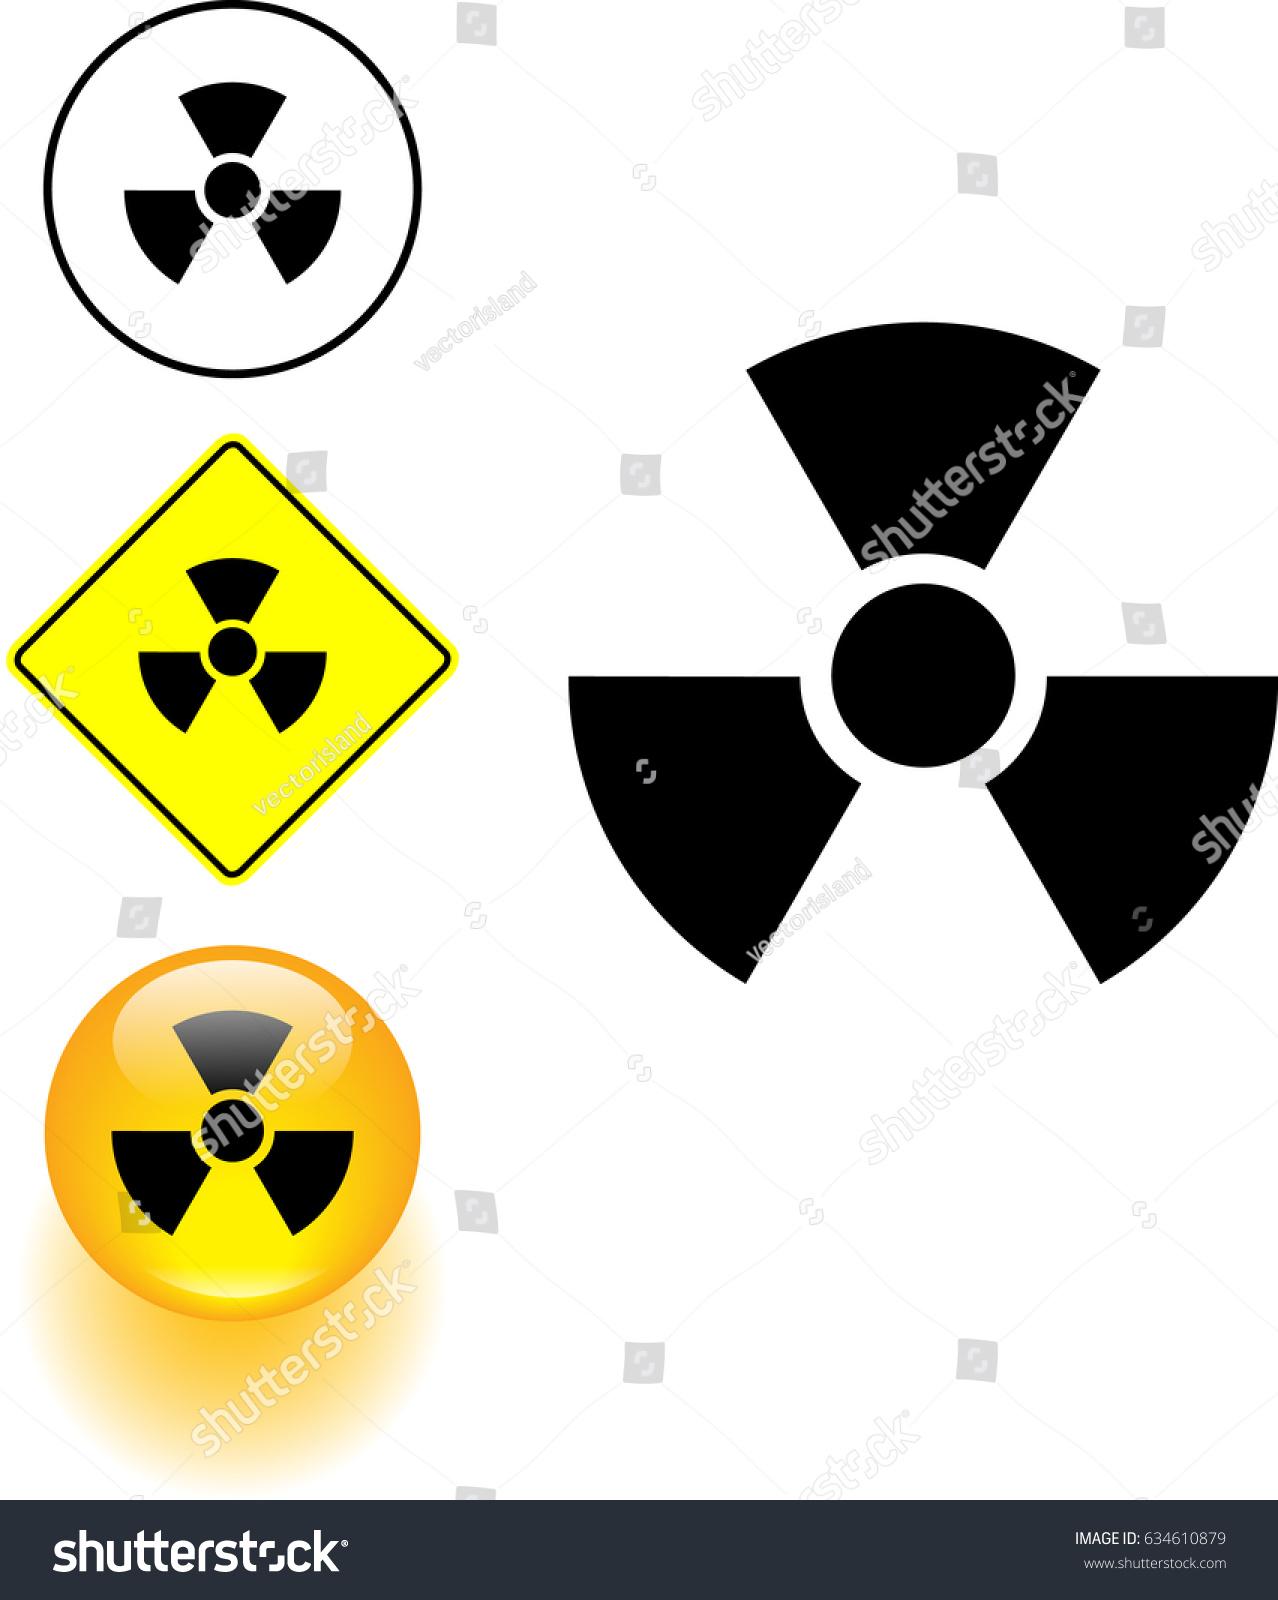 Radioactive symbol sign button stock vector 634610879 shutterstock radioactive symbol sign and button buycottarizona